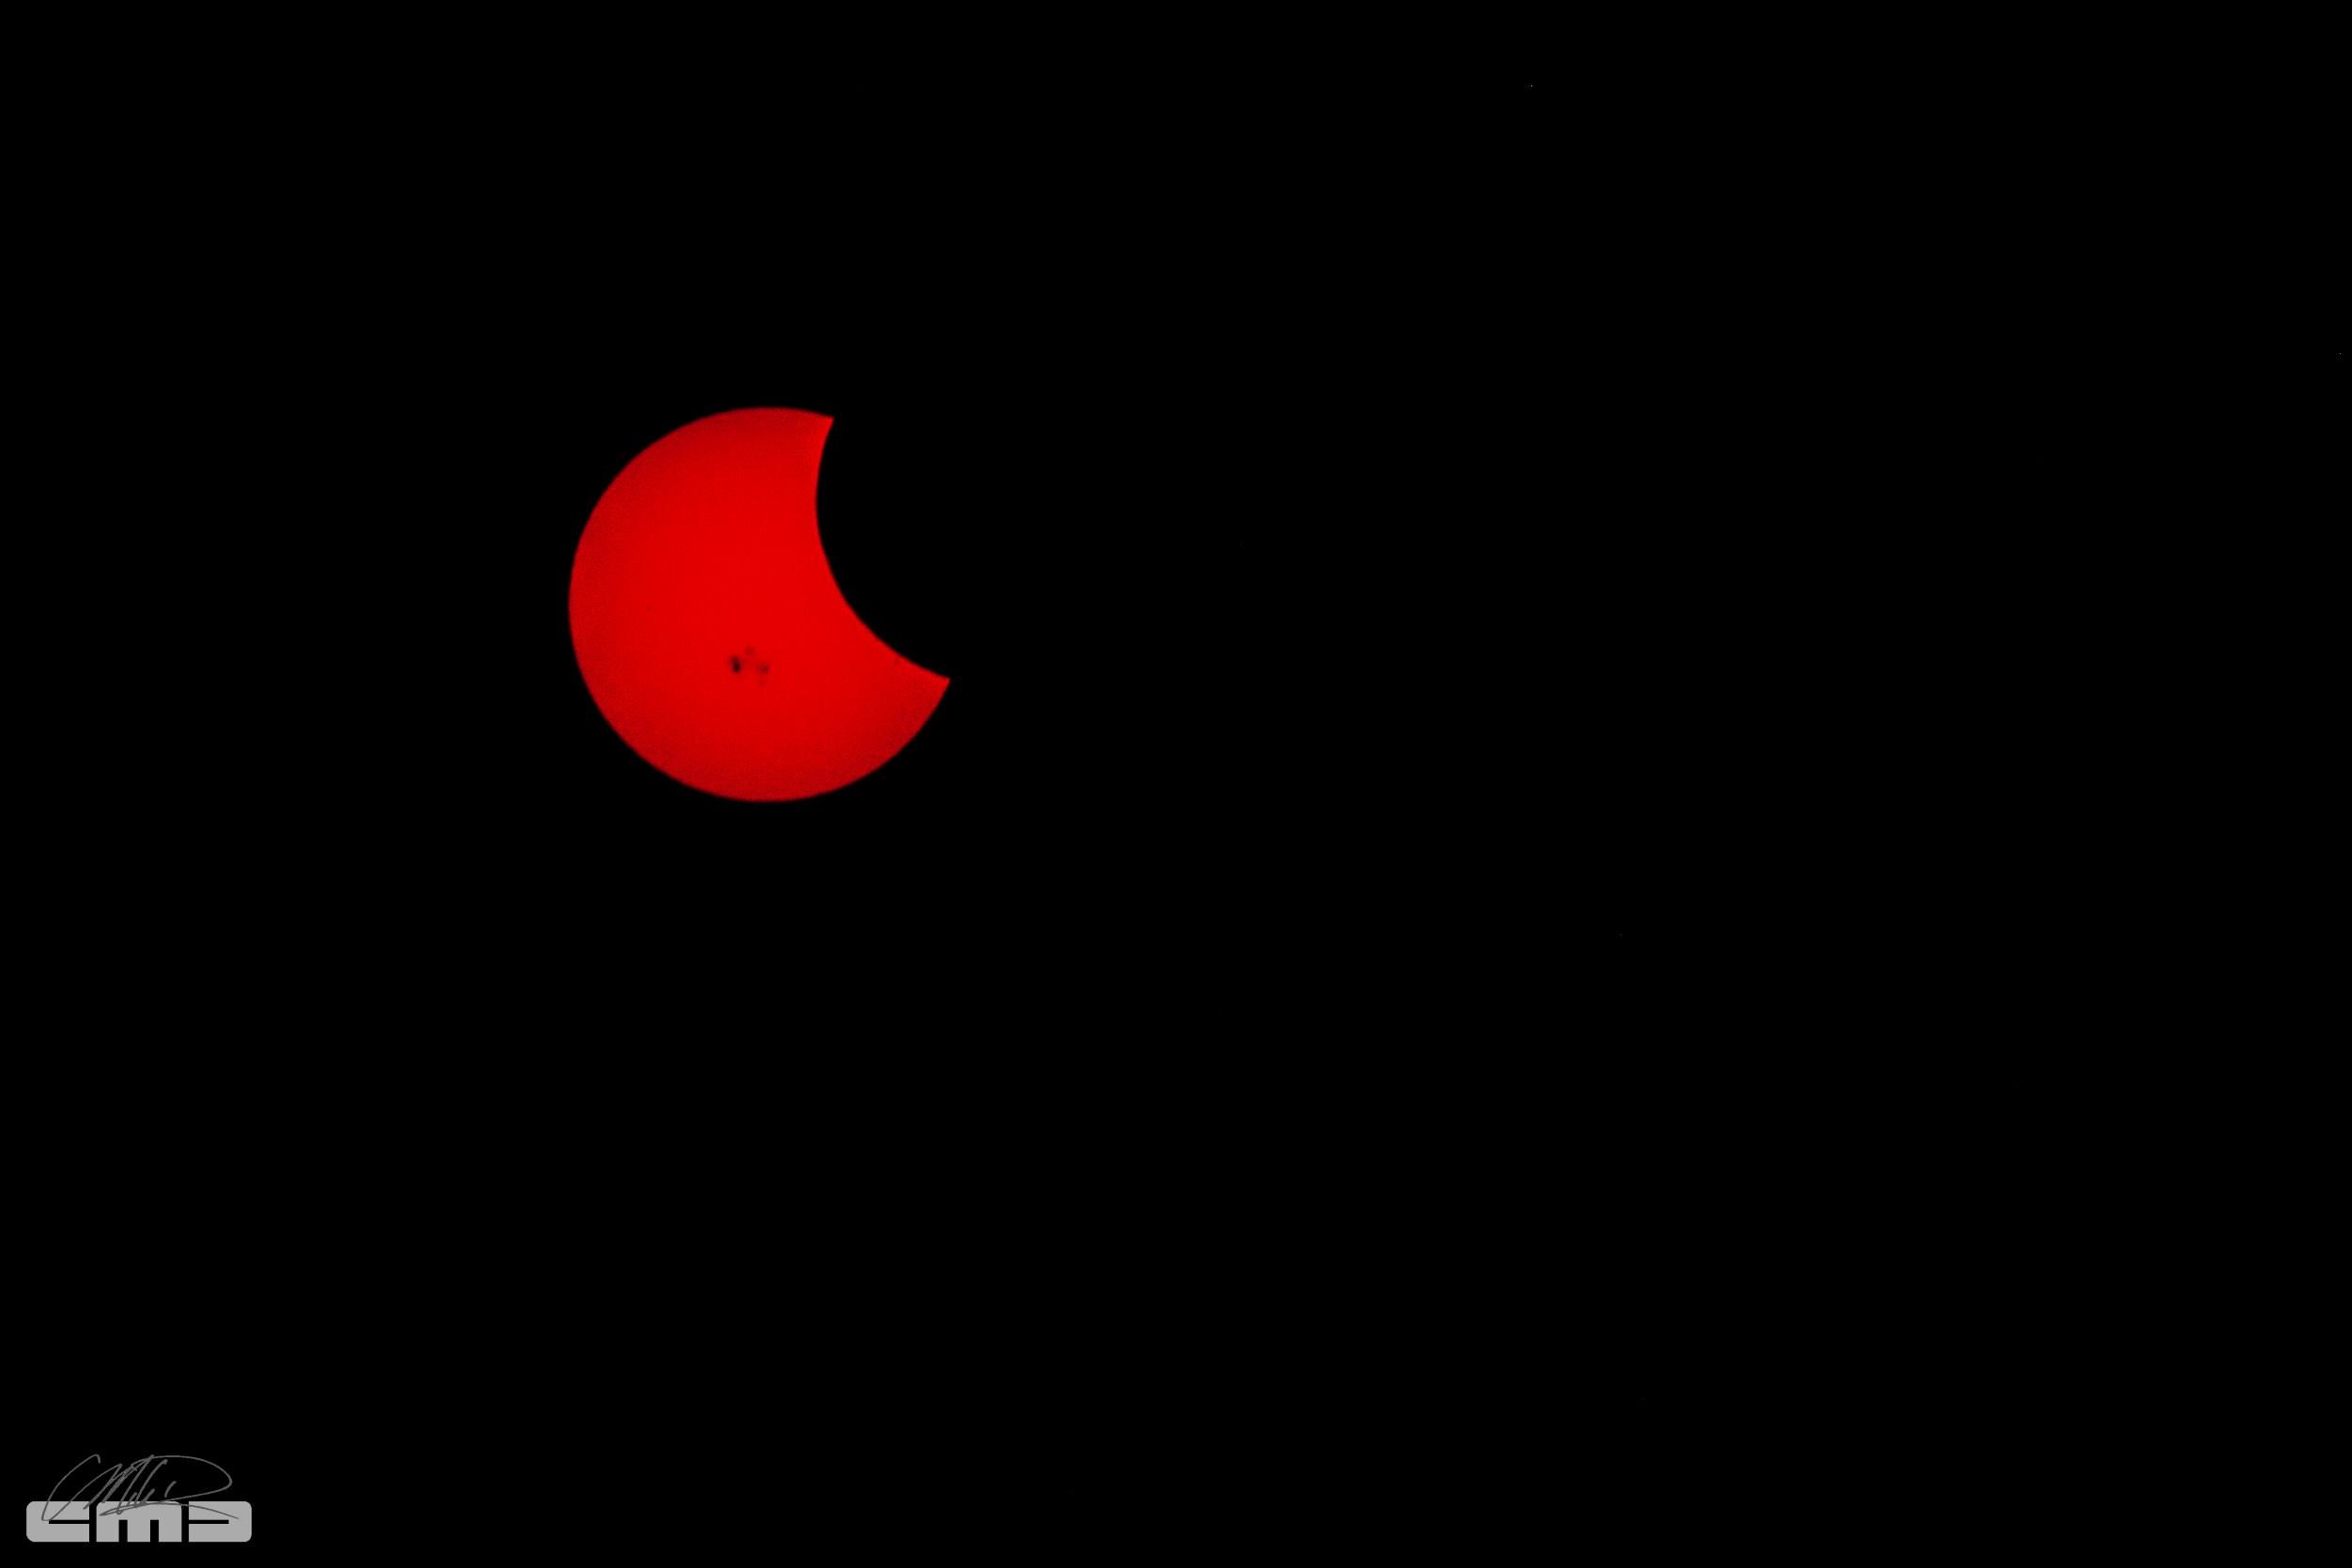 partial_solar_eclipse_5392